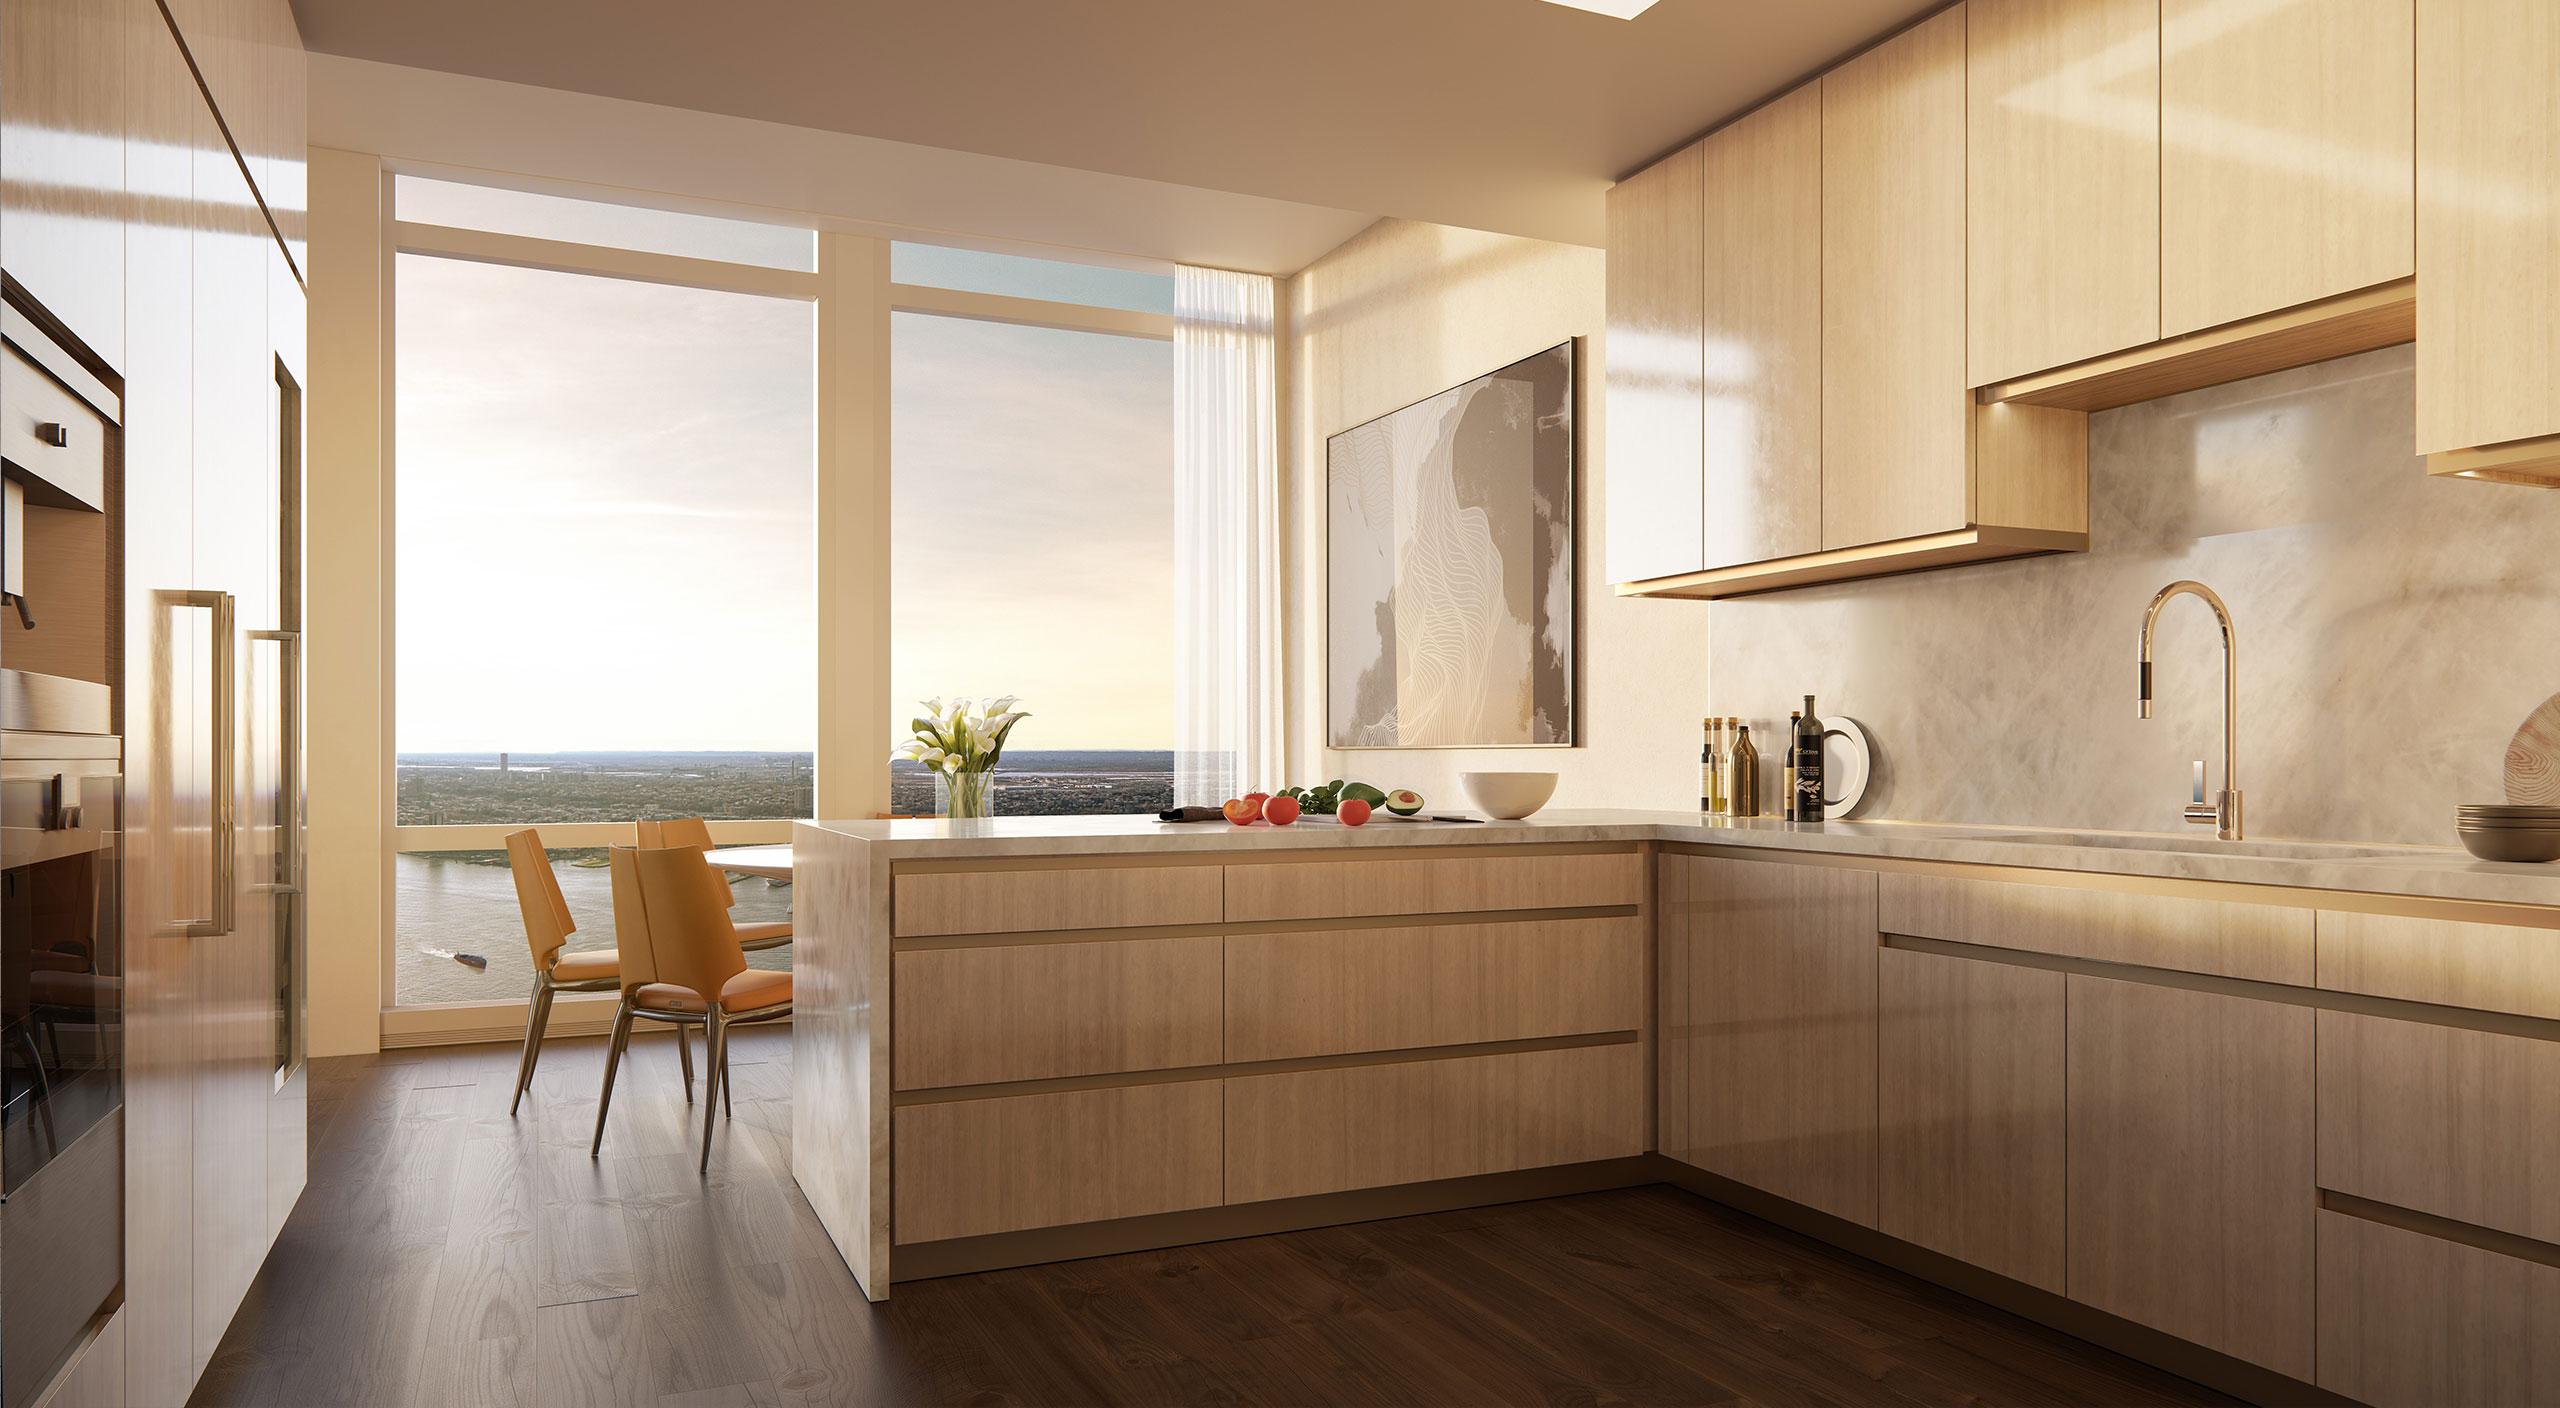 A Smallbone kitchen in 35 Hudsons Yard. New York